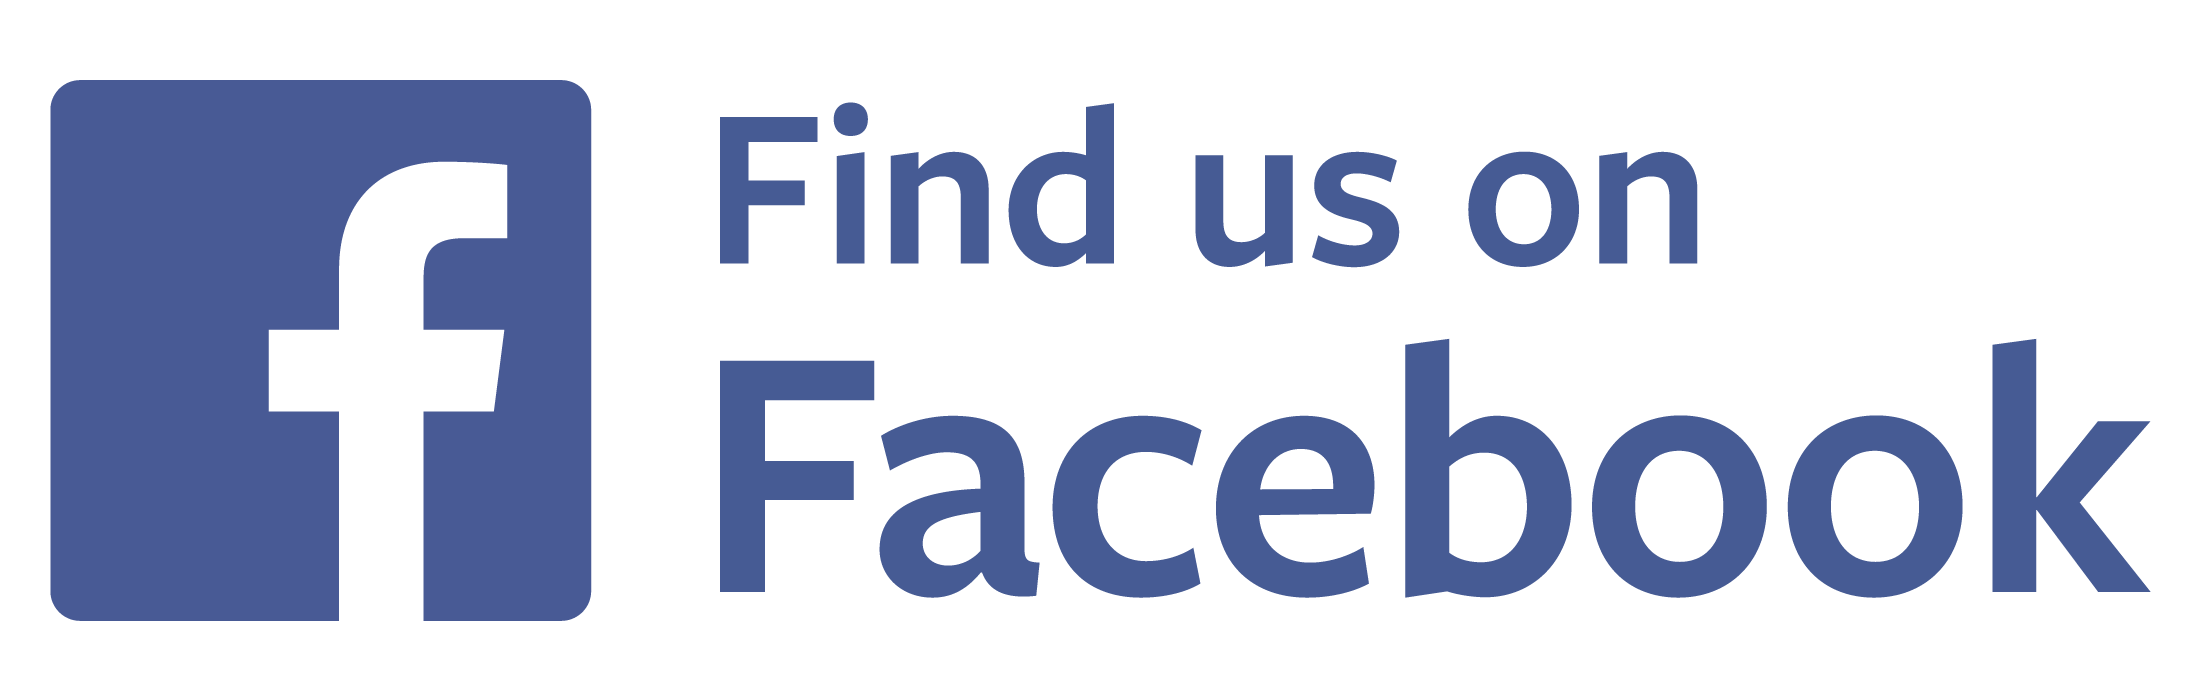 2200x700 Find Us On Facebook Logo Transparent Vector Free Vector